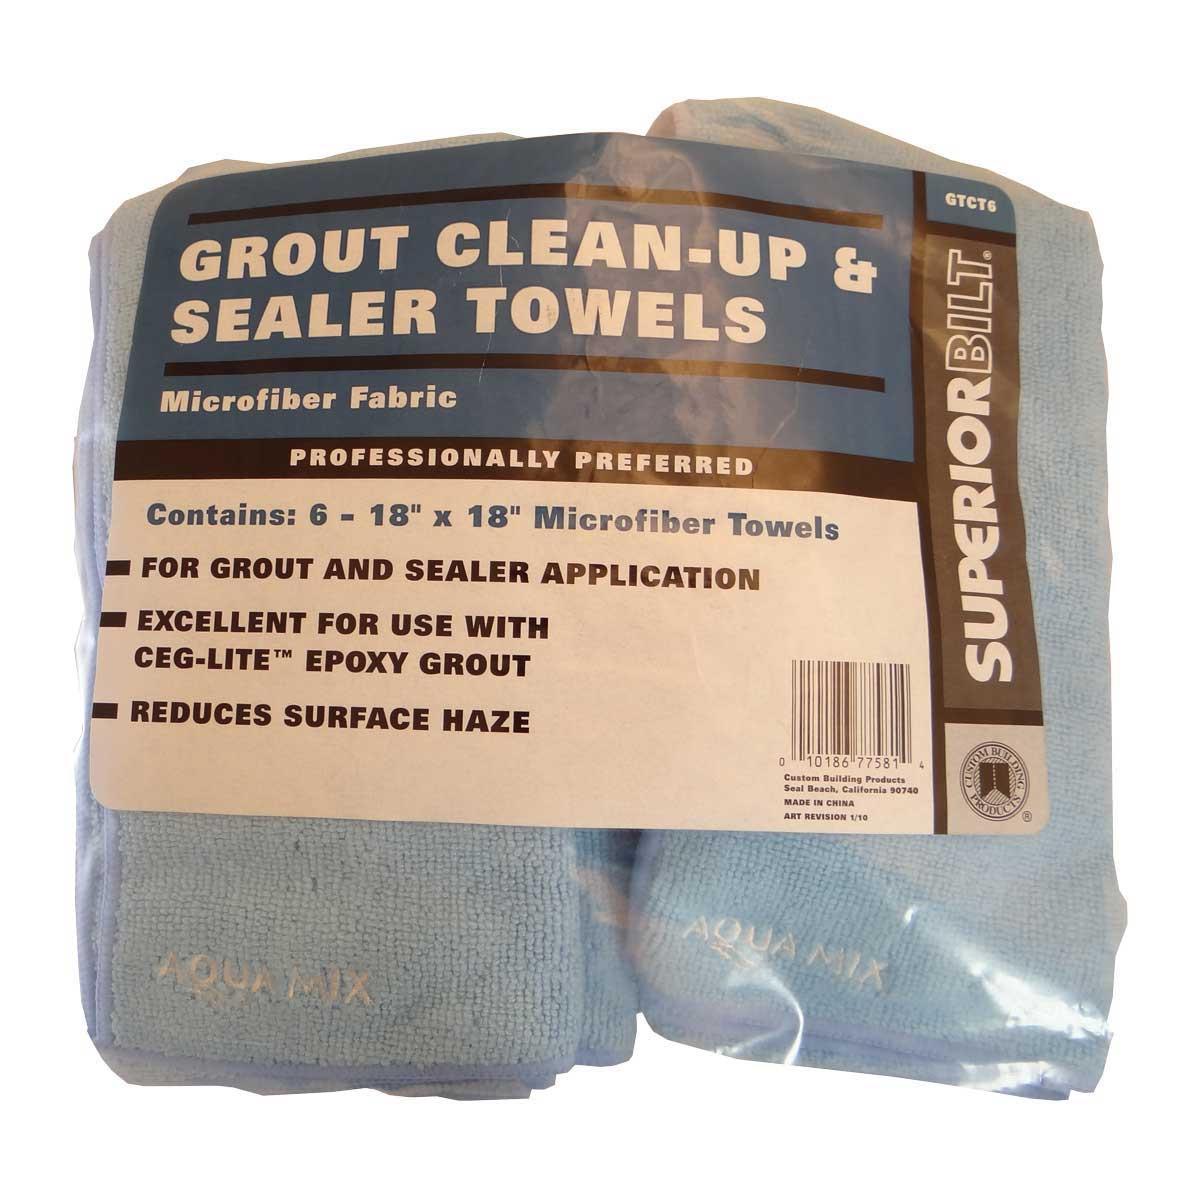 Superiorbilt Grout Clean Up Microfiber Towel Contractors